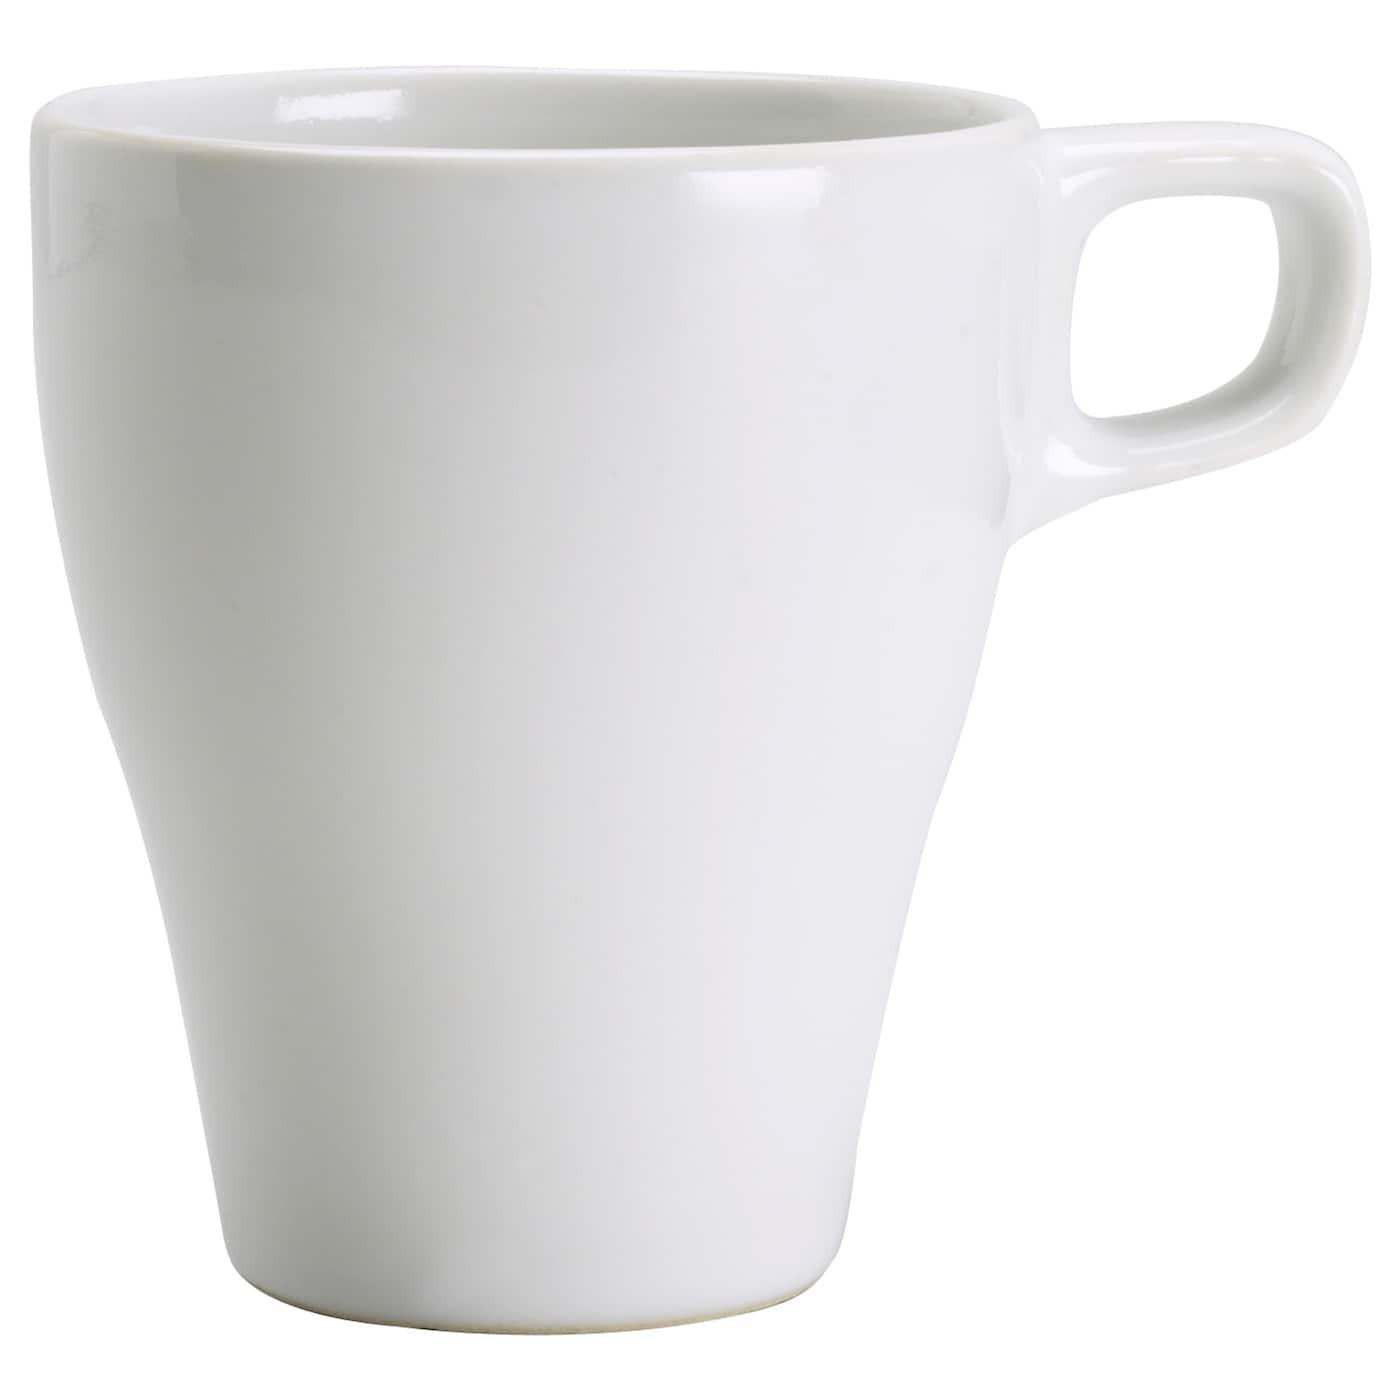 Cups Amp Mugs Ikea